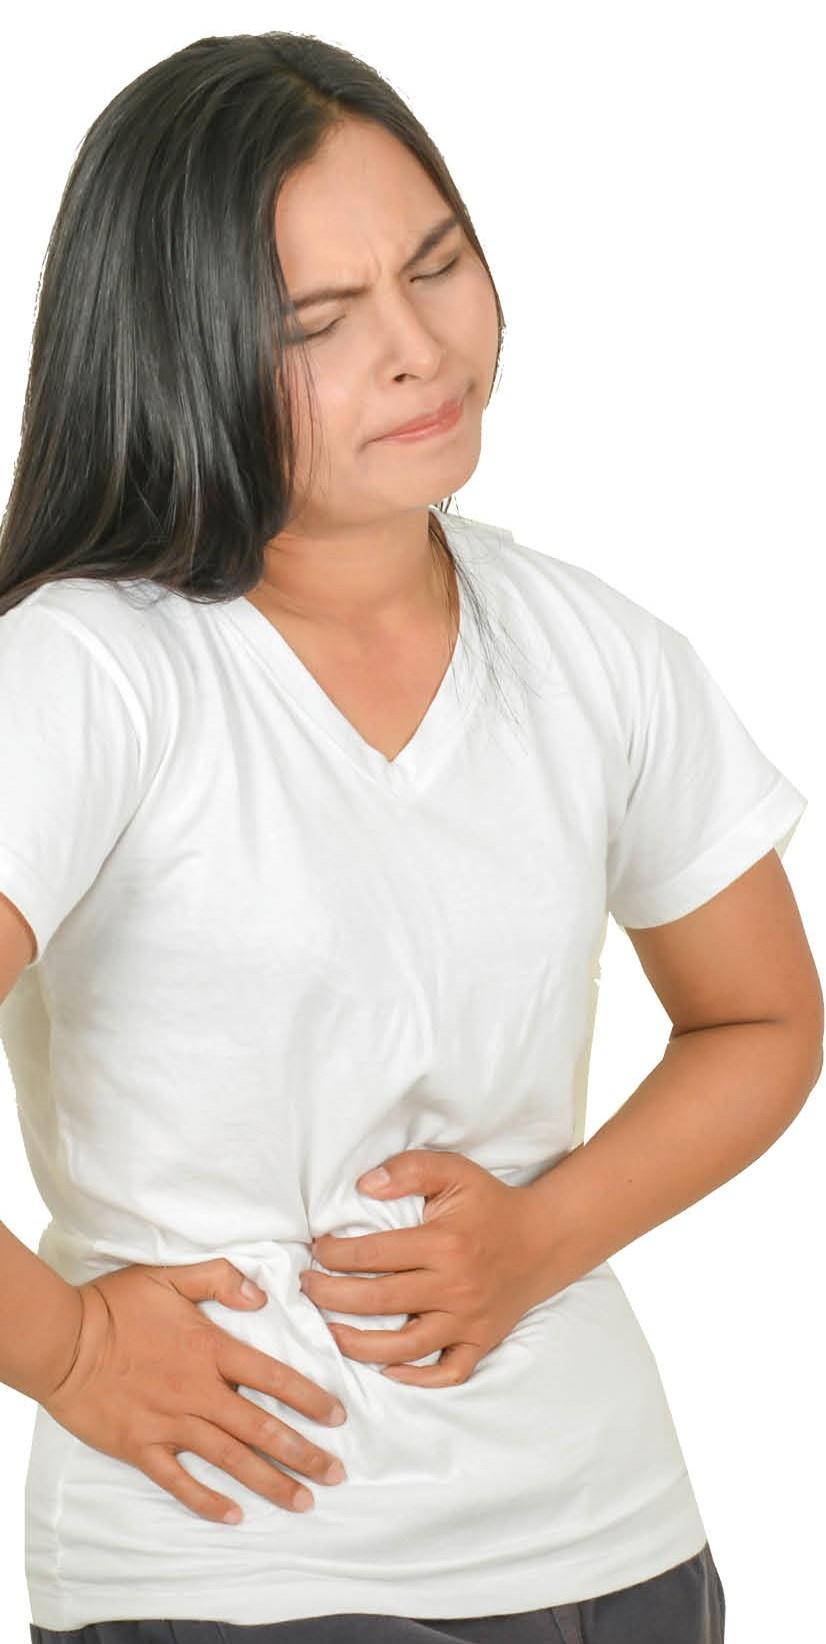 pcos, ovariële sindroom